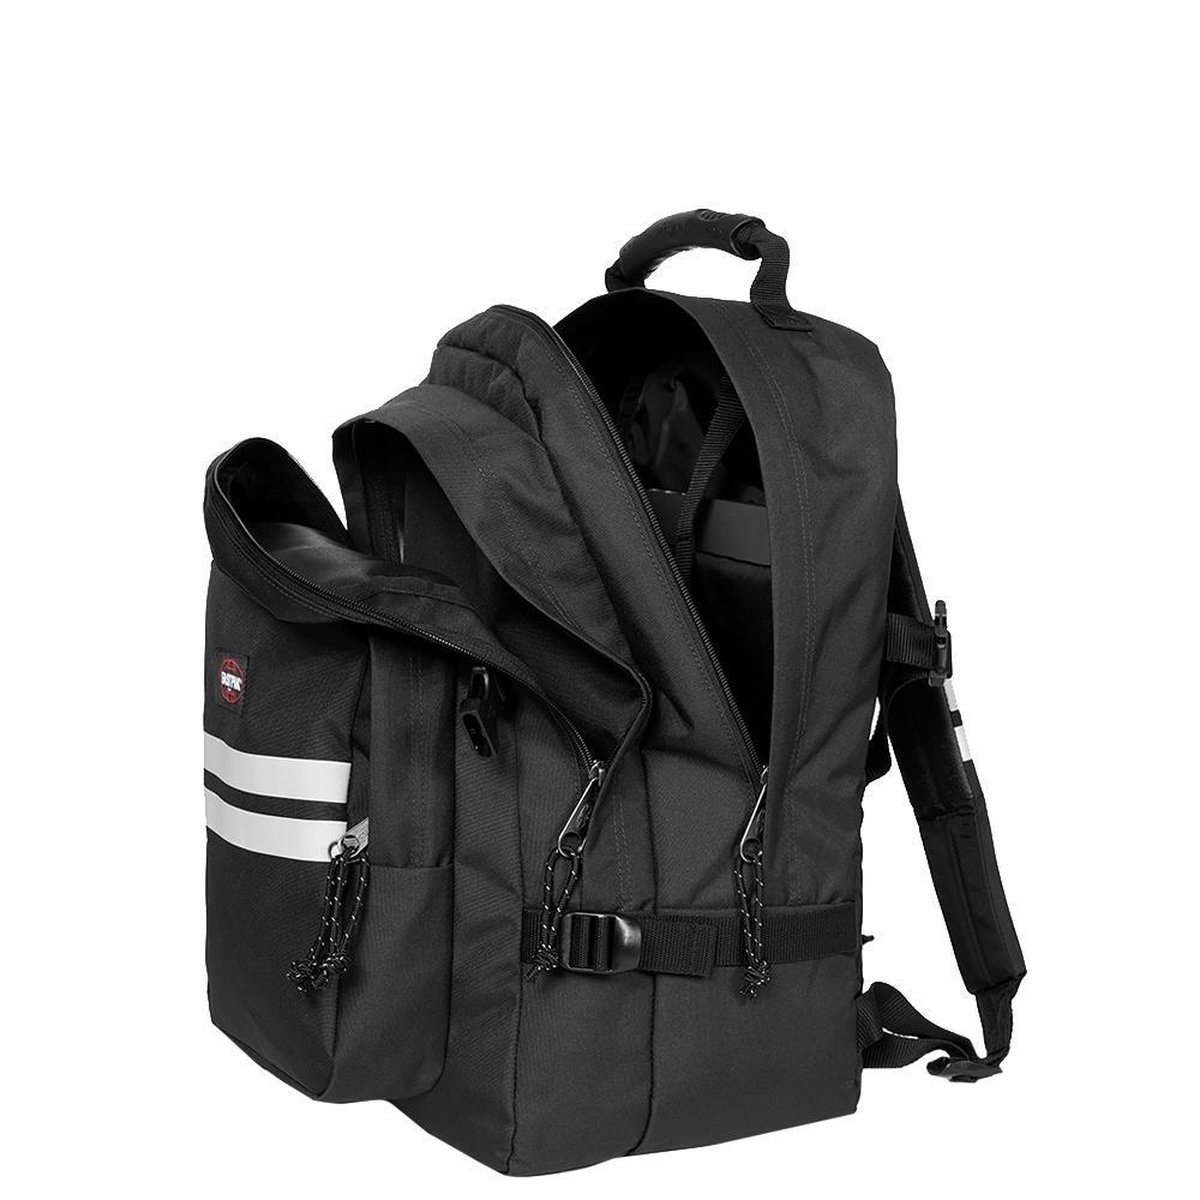 | Eastpak Provider rugzak 15.6 inch reflective black